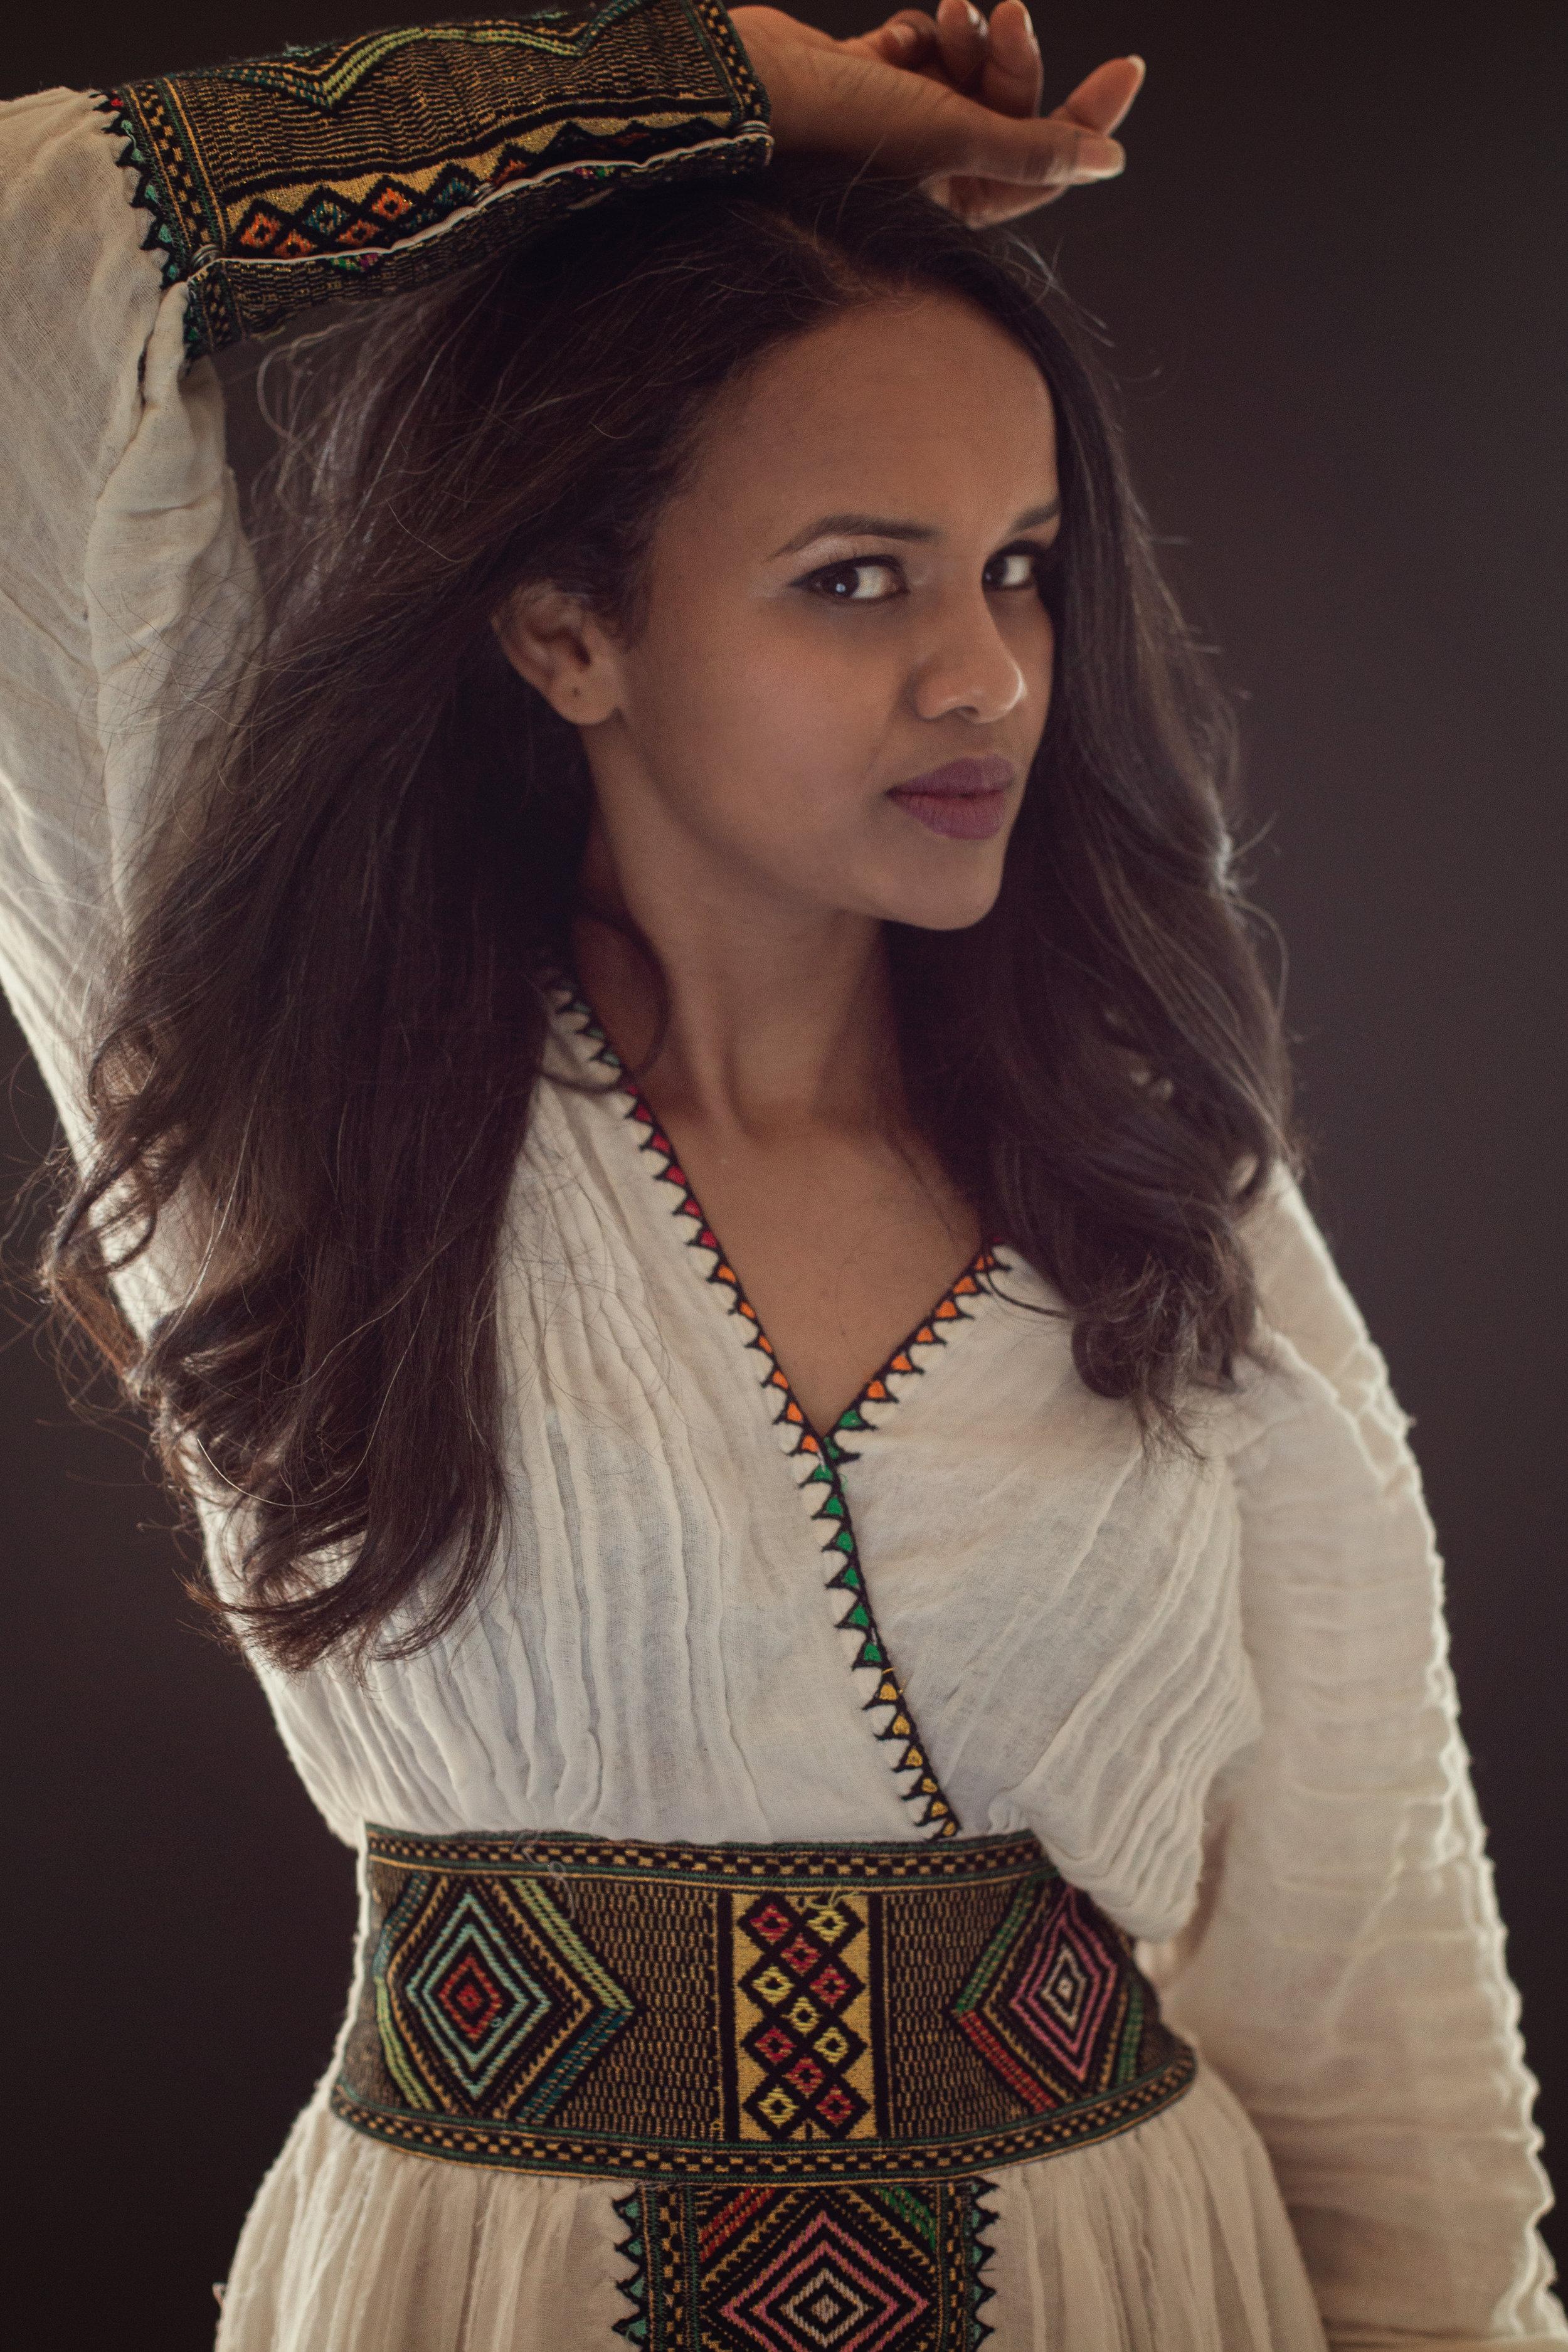 eritrean glamour